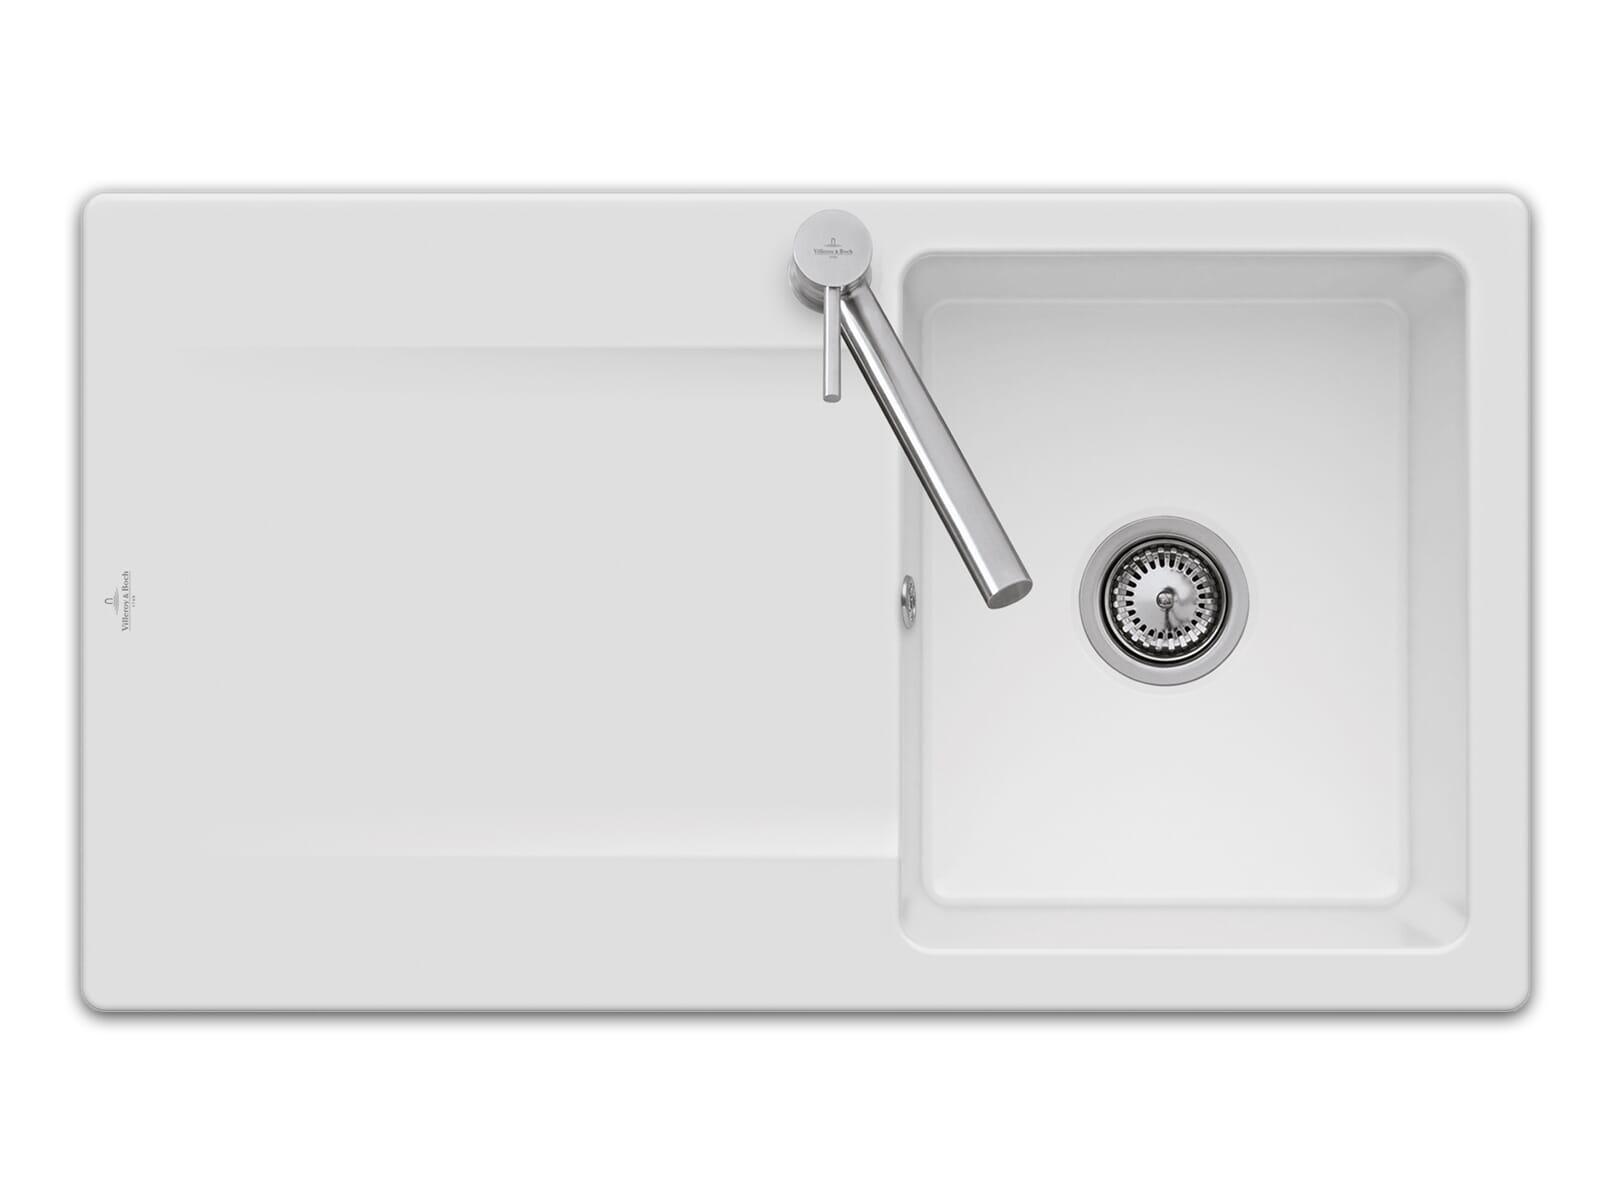 Villeroy & Boch Siluet 50 - 3335 01 KG Snow White Keramikspüle Handbetätigung